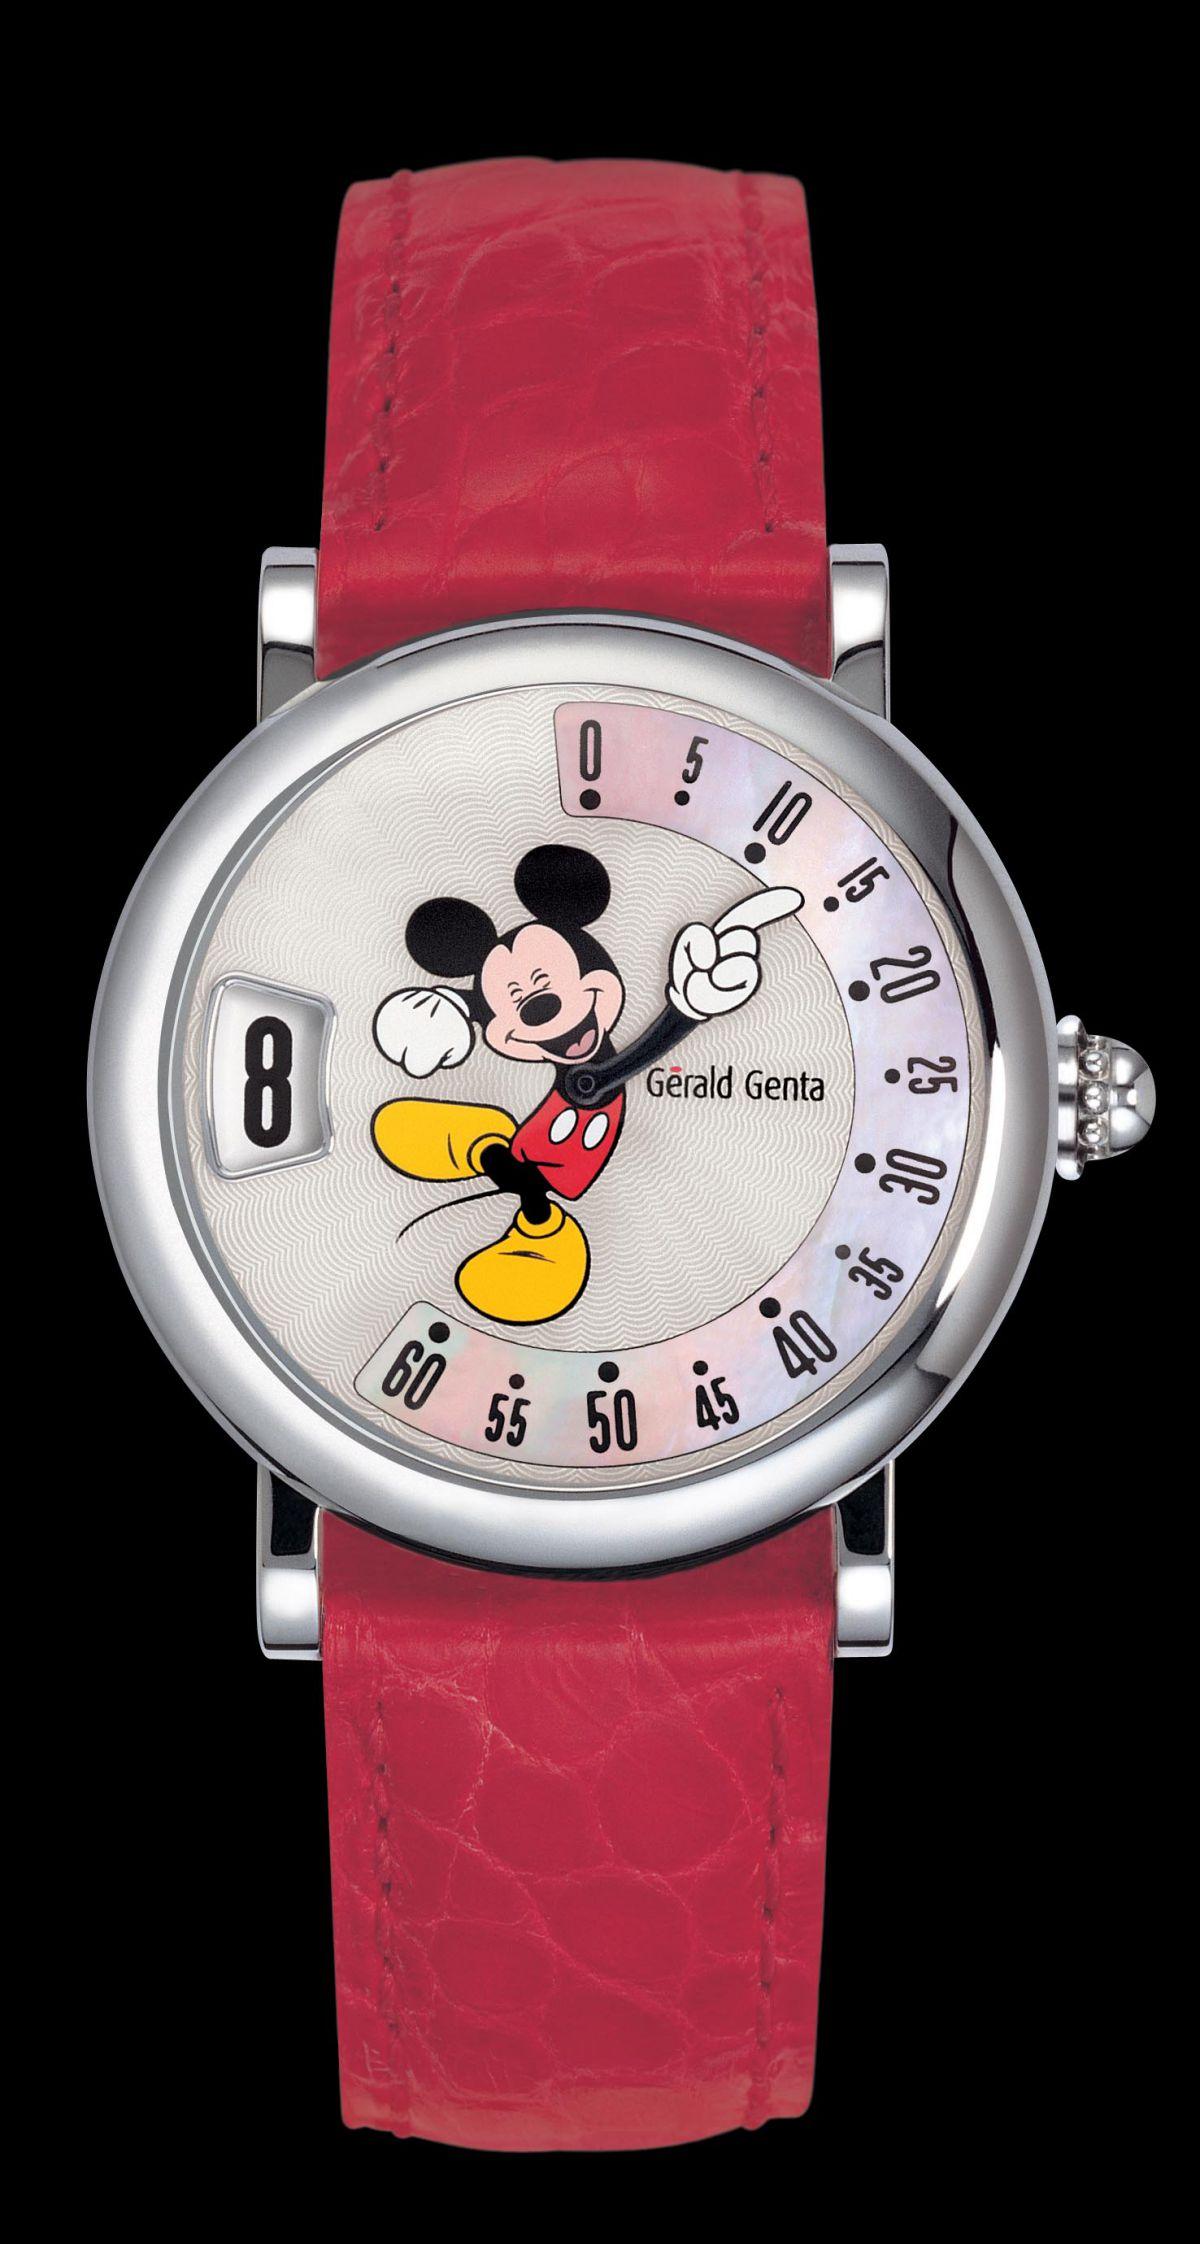 gerald-genta-mickey-mouse-2.jpg